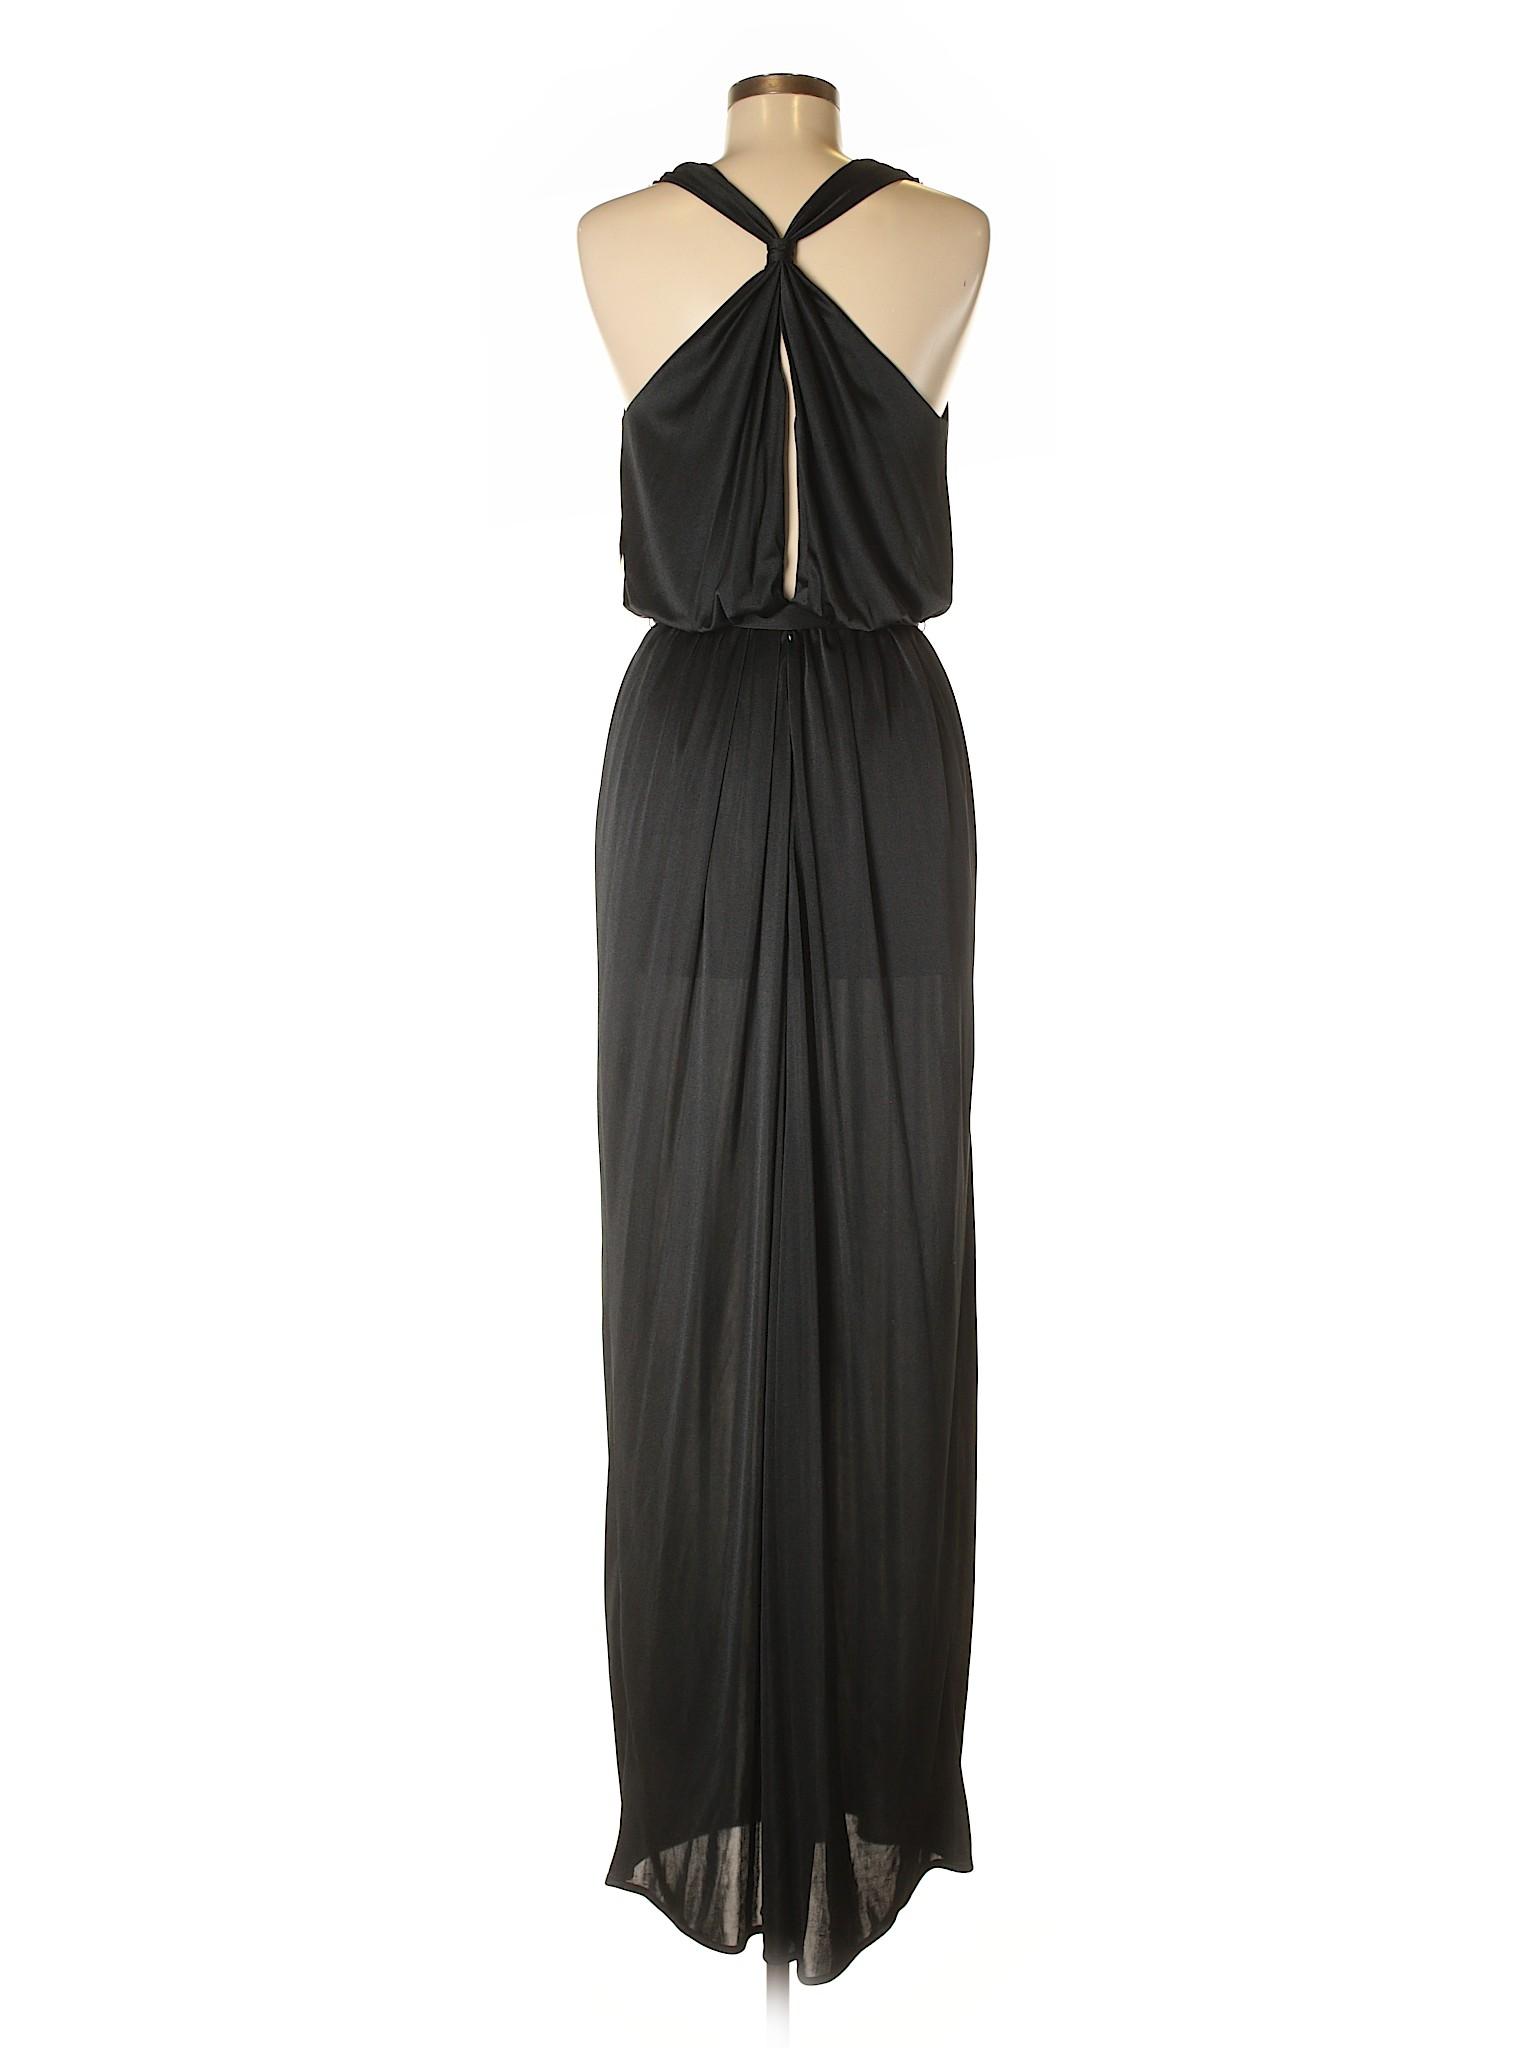 James Dress Cocktail by Mark Mischka Boutique Badgley winter En8wTq14R